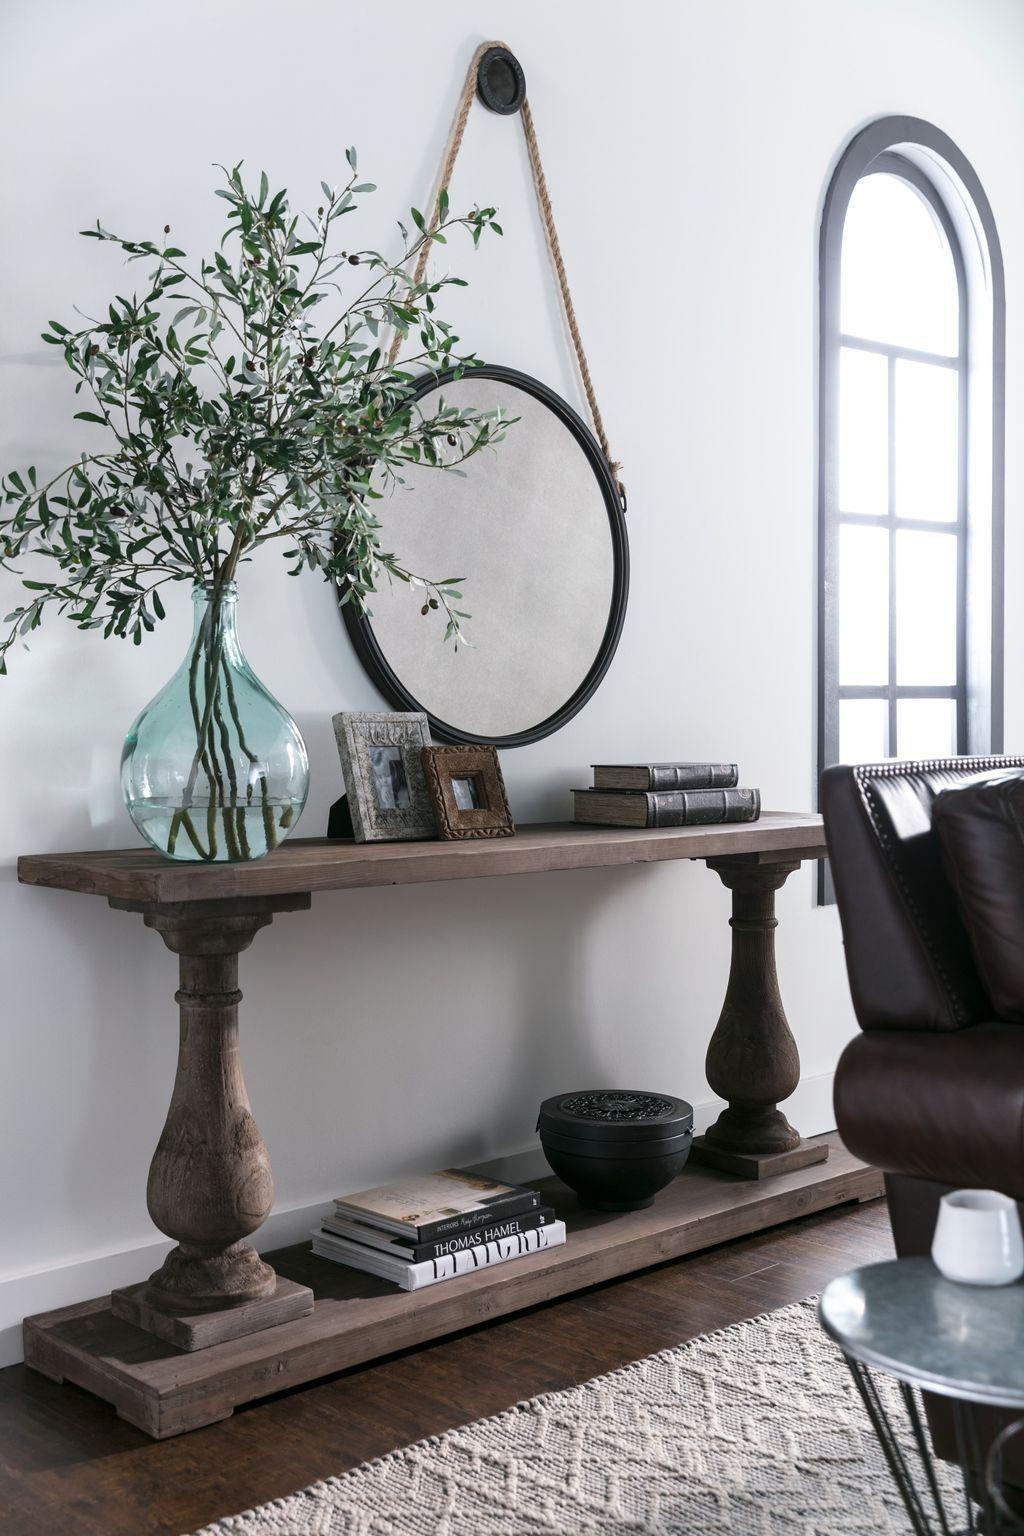 50 Inspiring Console Table Ideas Homyhomee Sofa Table Decor Living Room Decor Decor